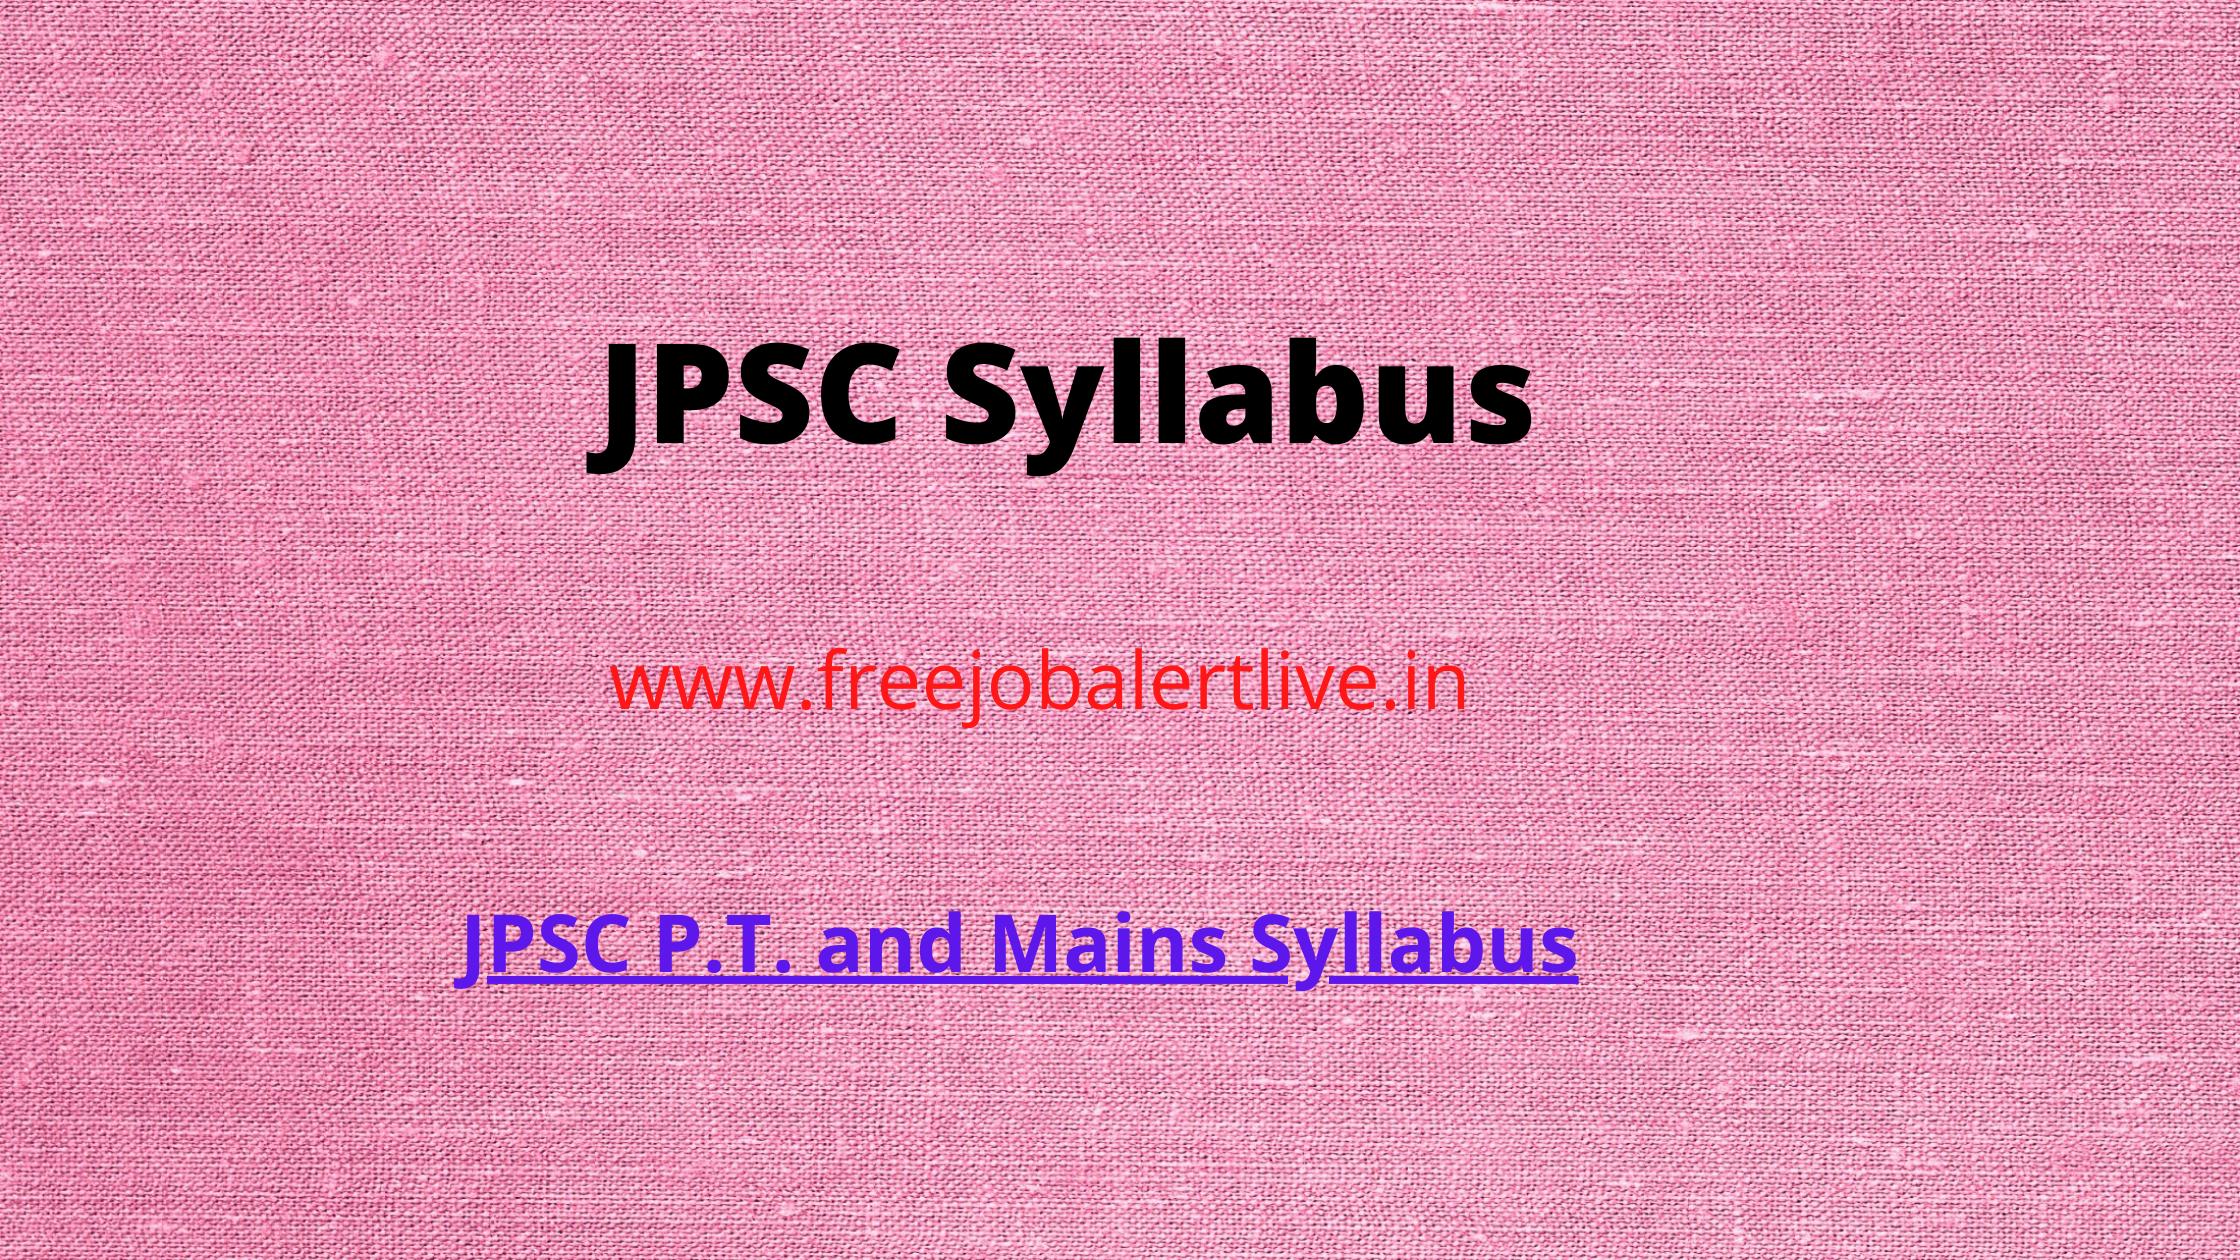 JPSC Syllabus